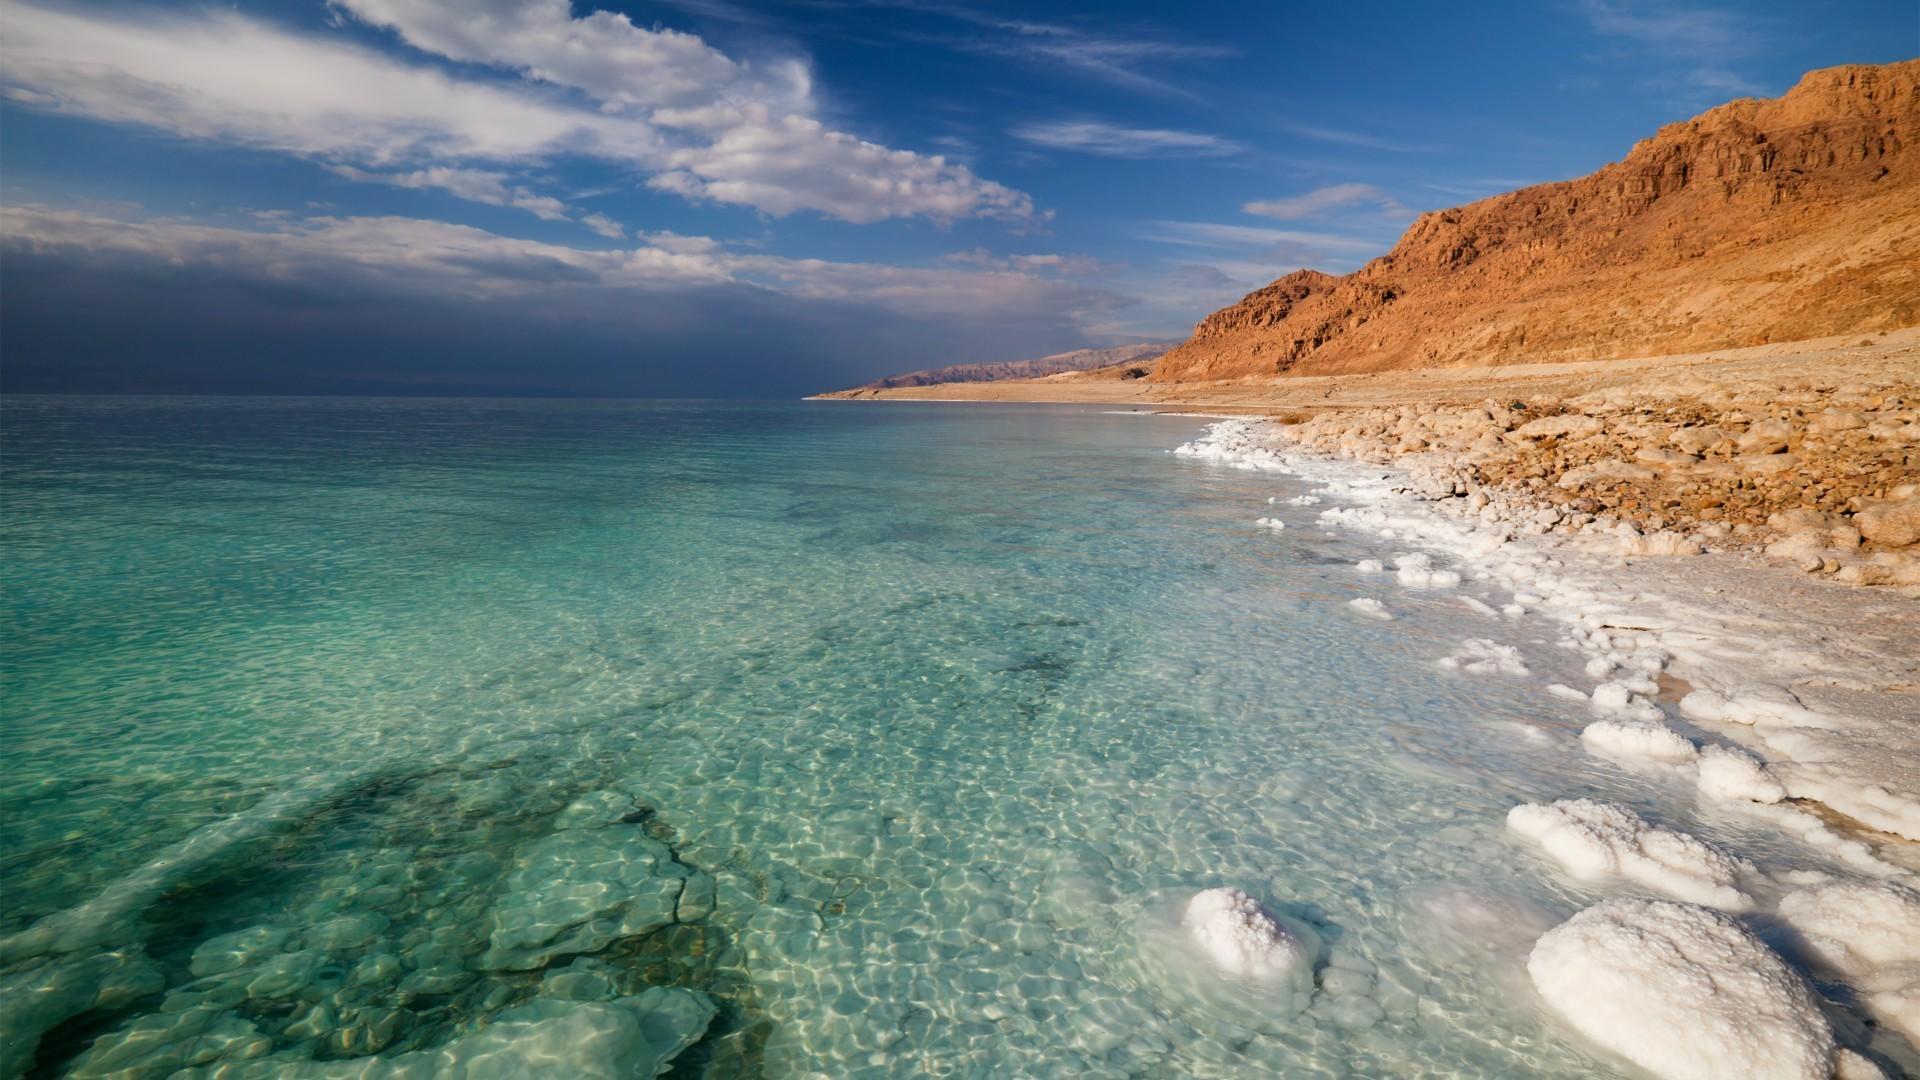 nature, Landscape, Mountains, Clouds, Dead Sea, Salt lakes, Stones, Israel  Wallpapers HD / Desktop and Mobile Backgrounds